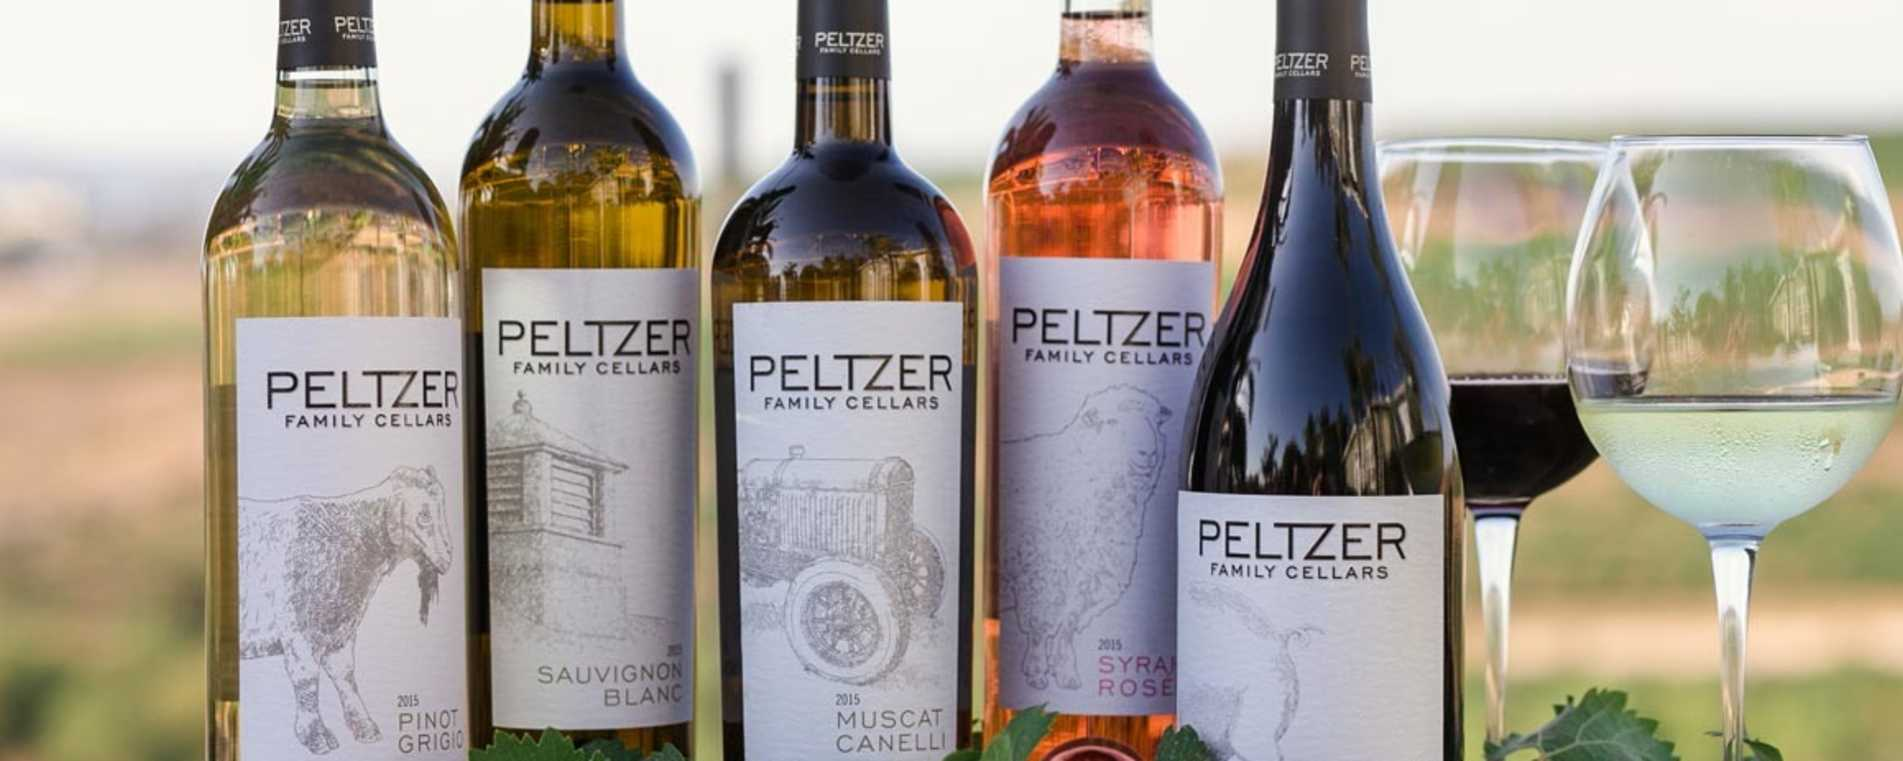 Peltzer Winery Wines - Temecula